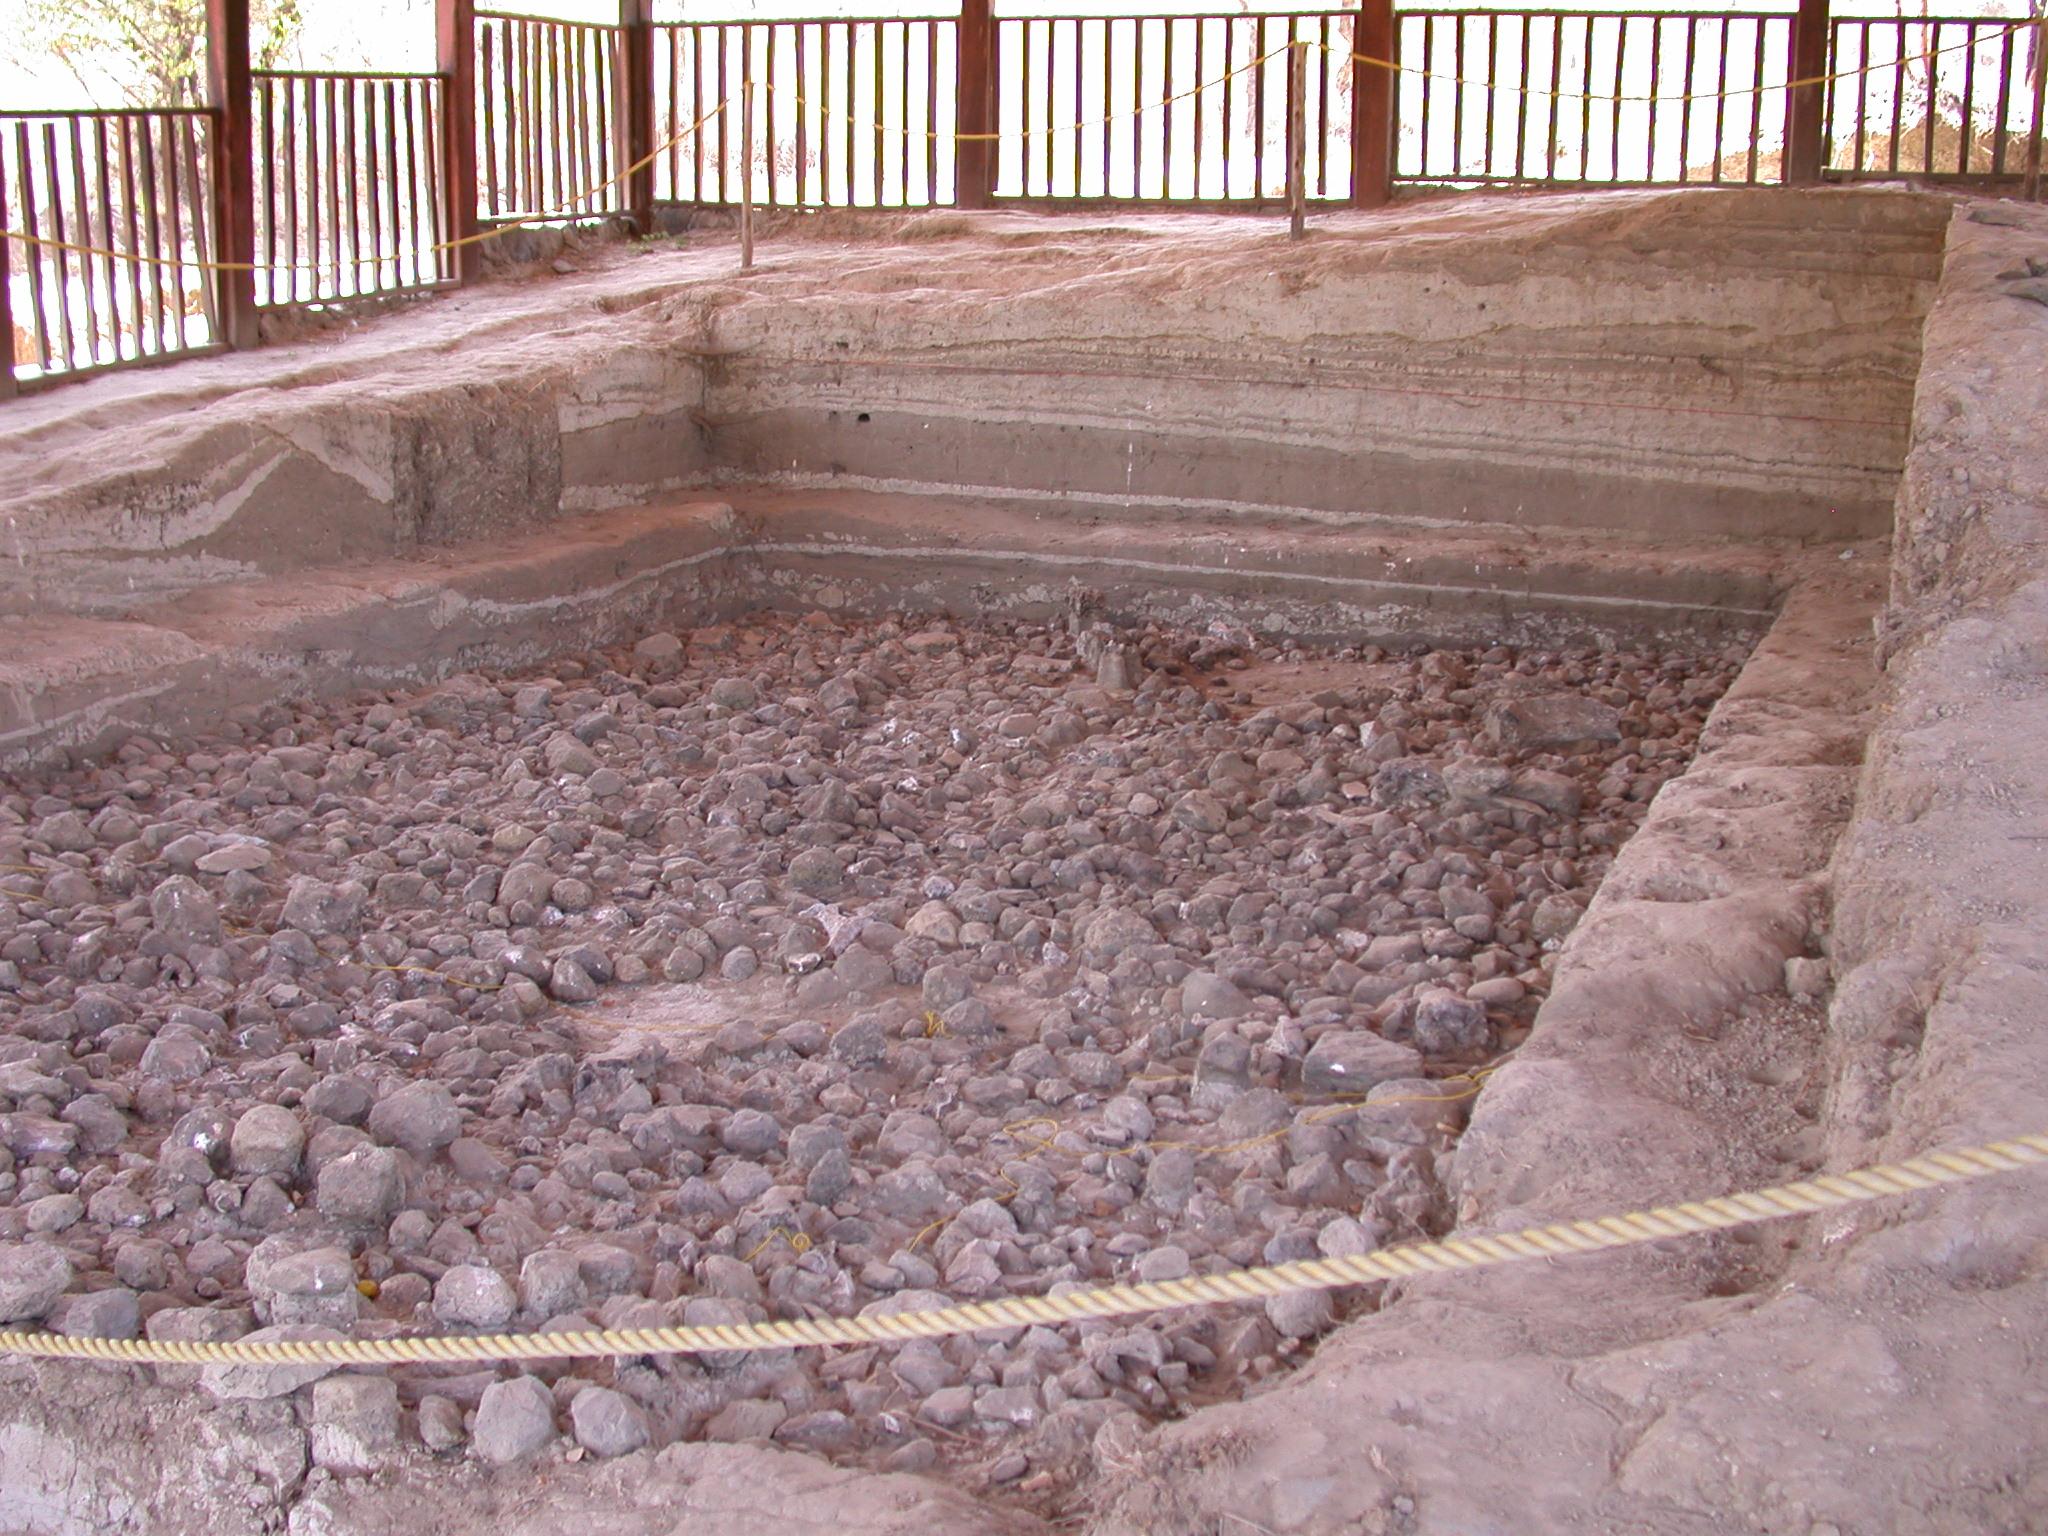 Excavation Site, Melka Kunture, Ethiopia